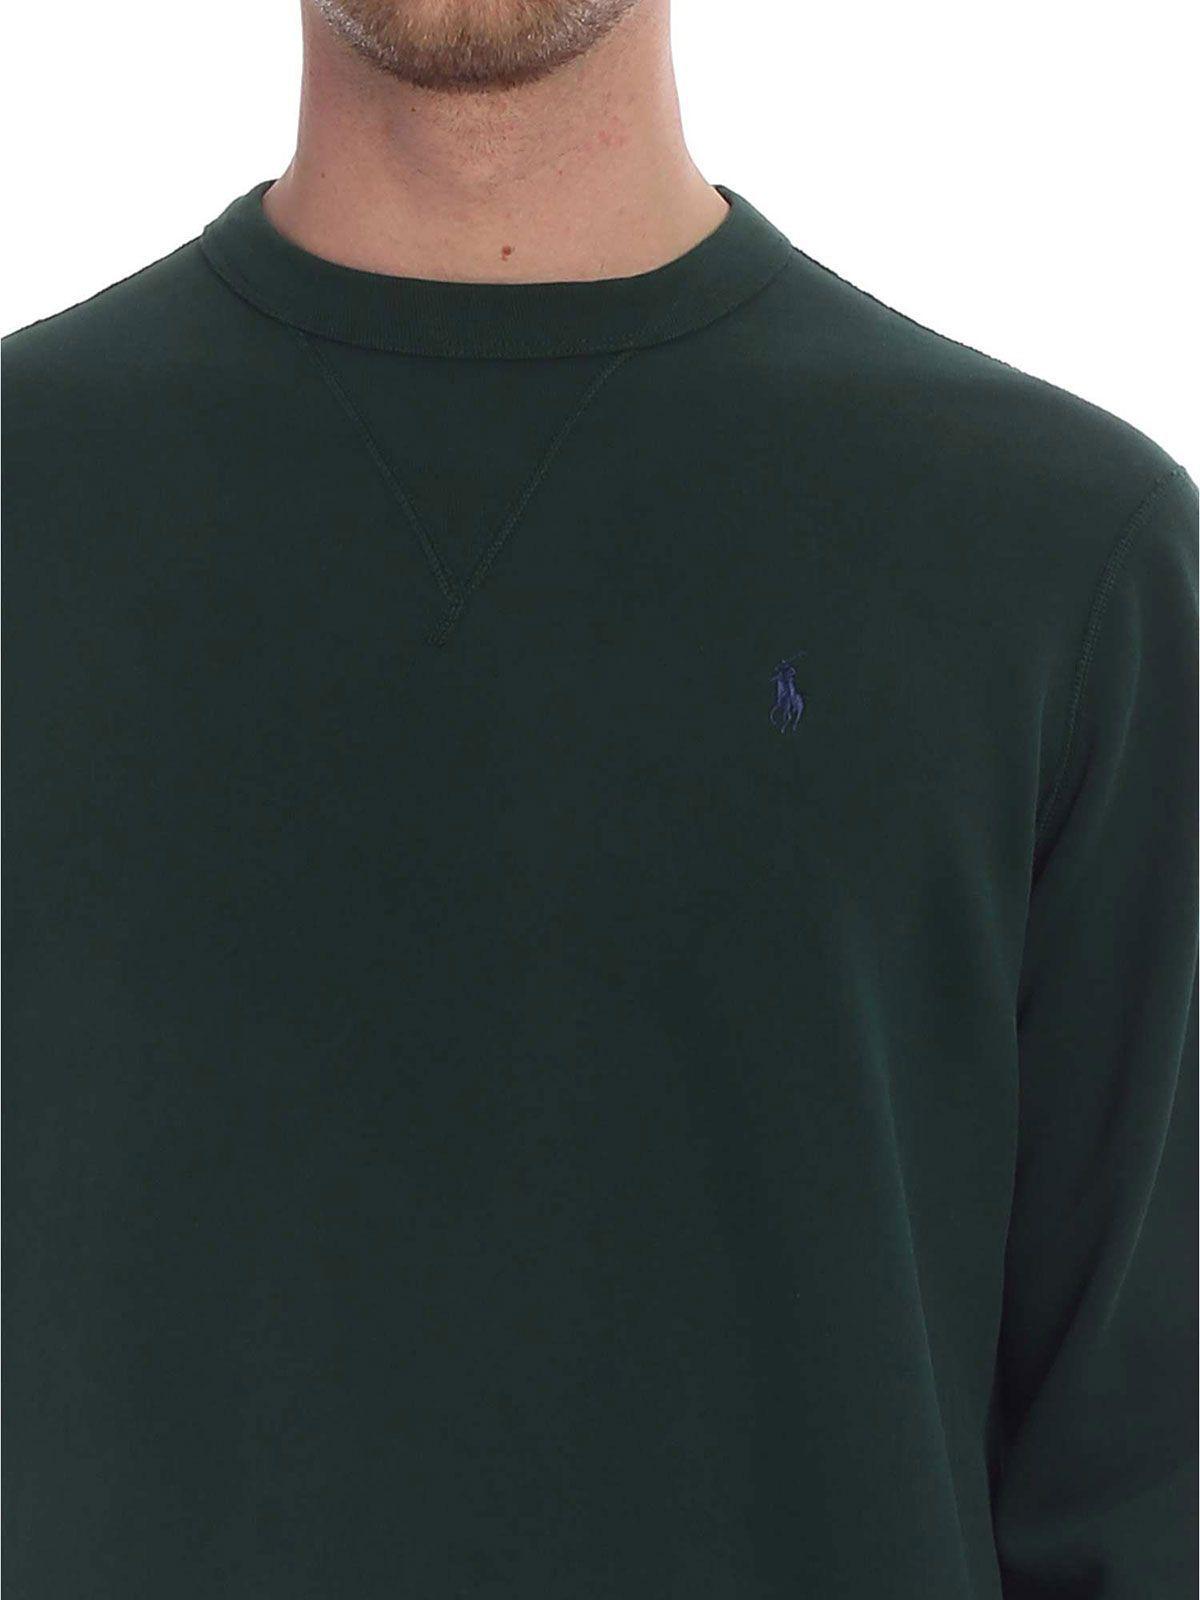 RALPH LAUREN MEN'S 710733123006 GREEN COTTON SWEATER